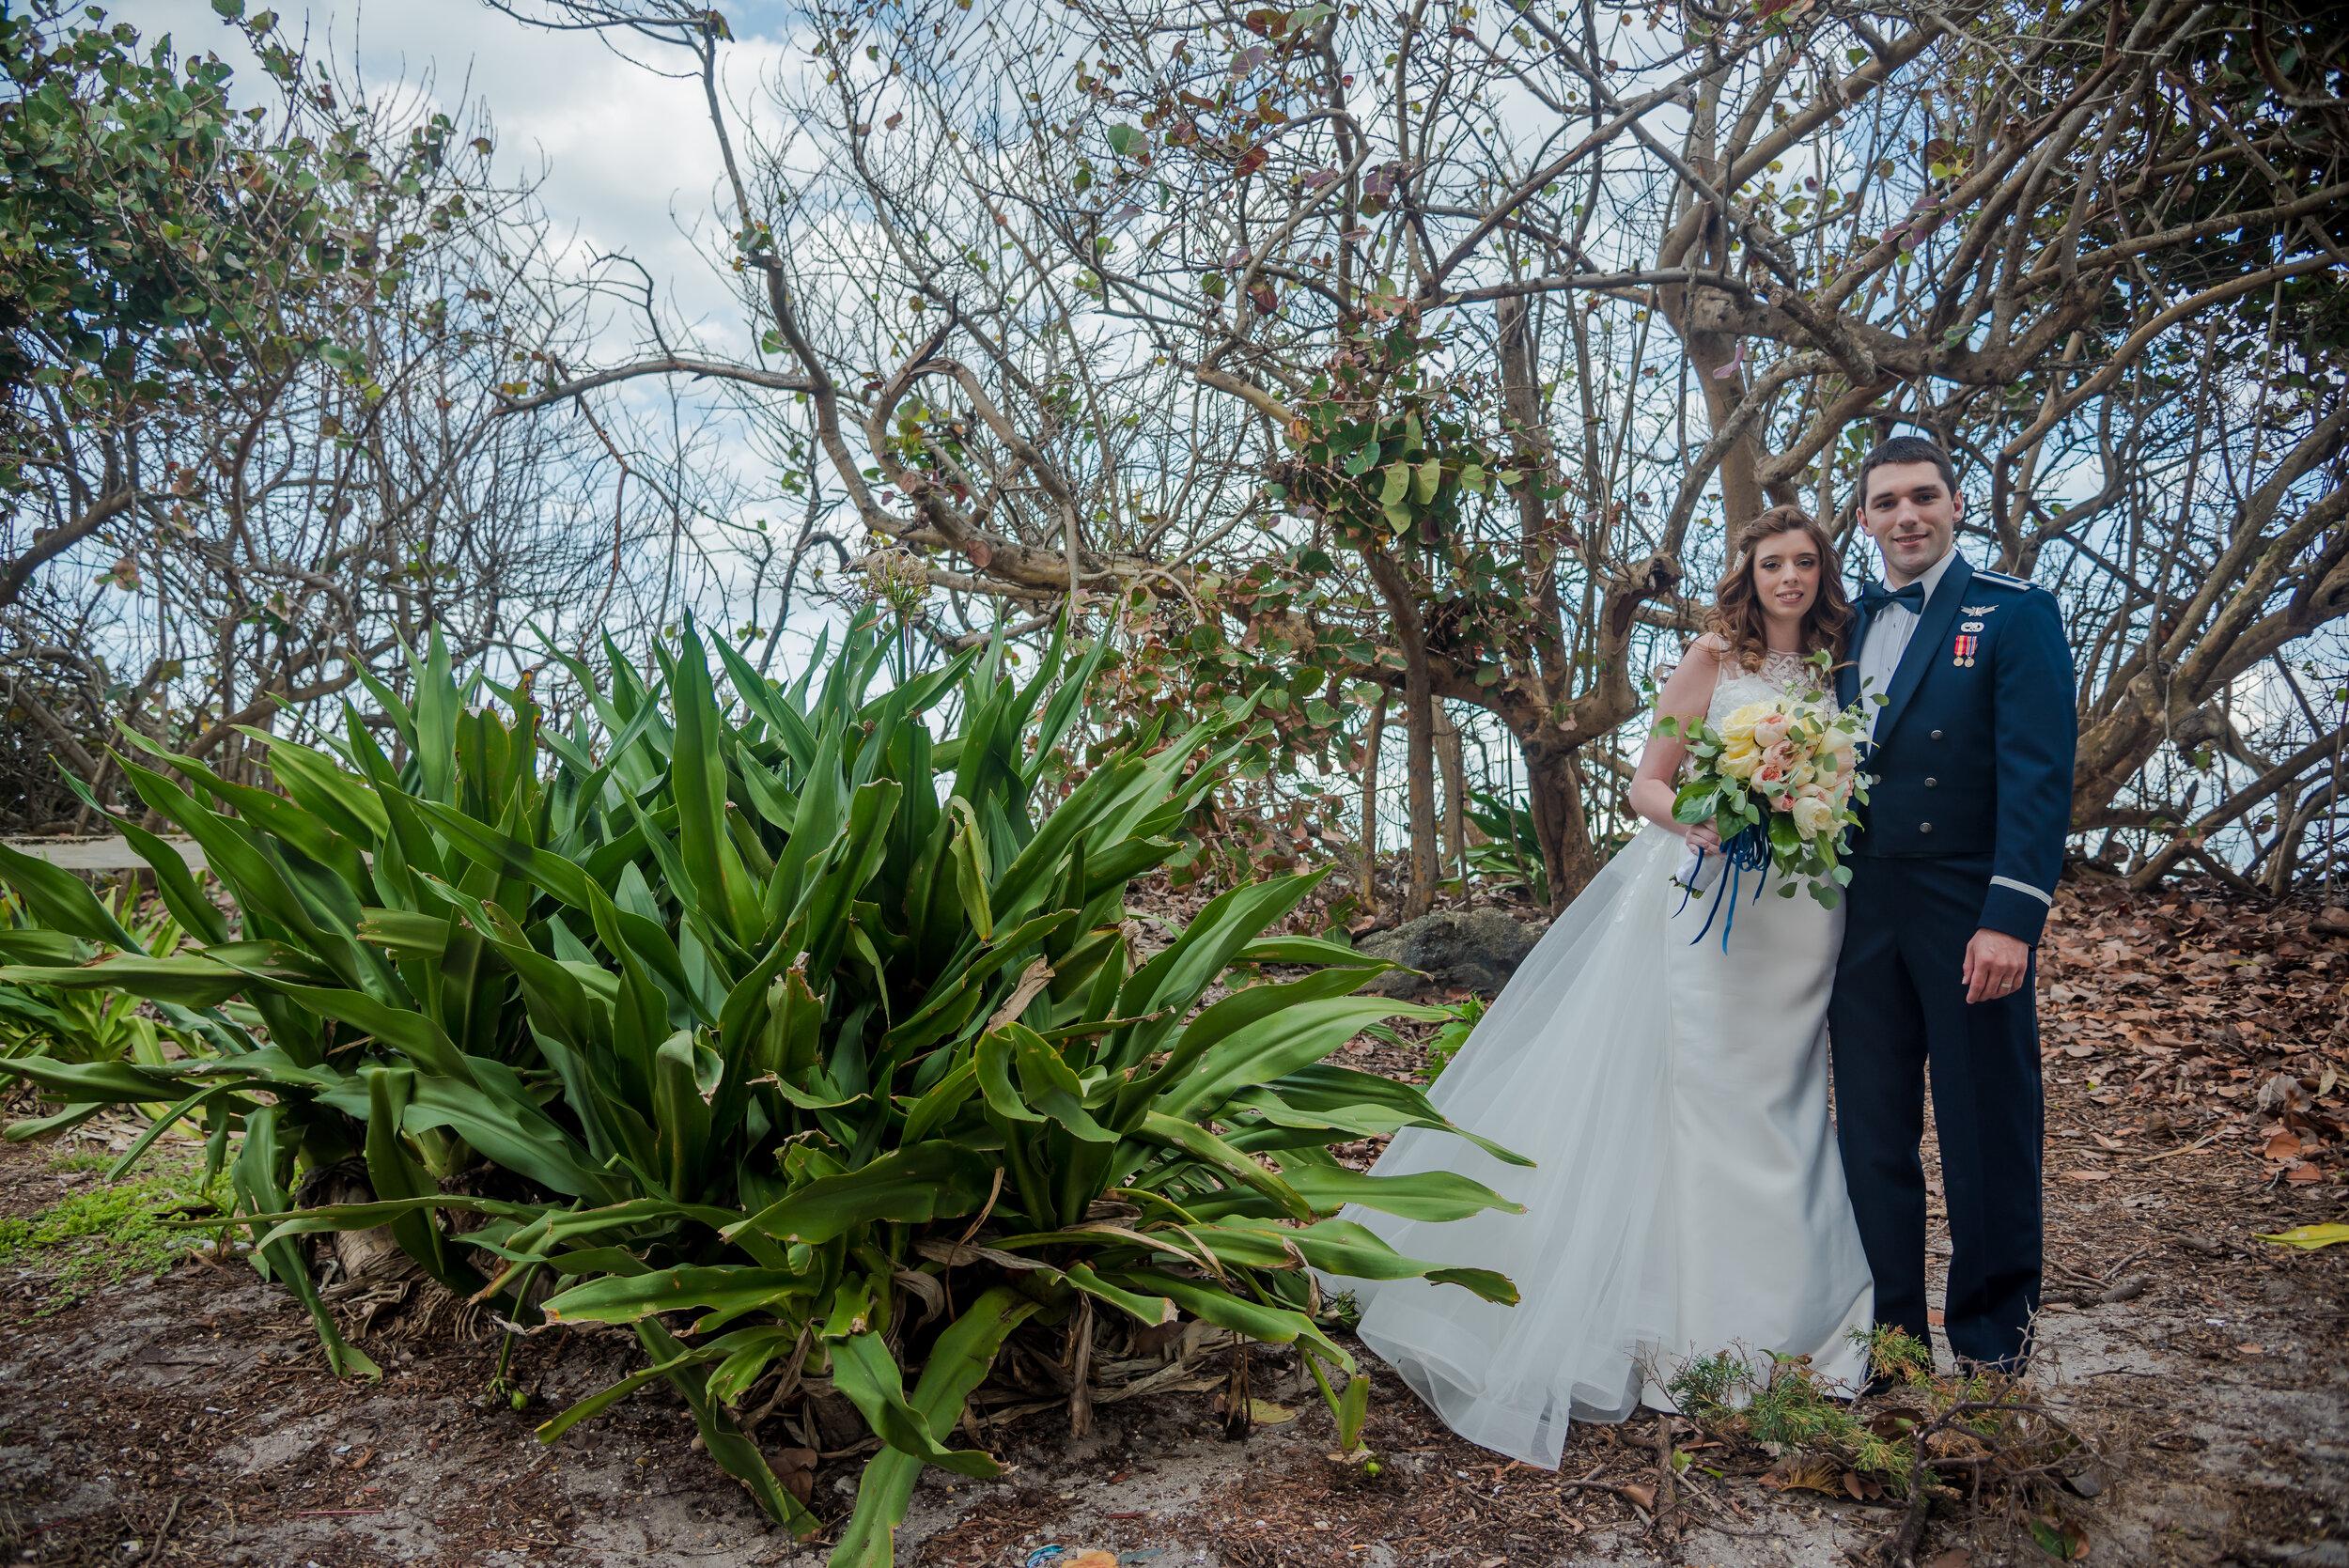 andru-the-tide-club-air-force-wedding-patrickafb-1-2.jpg